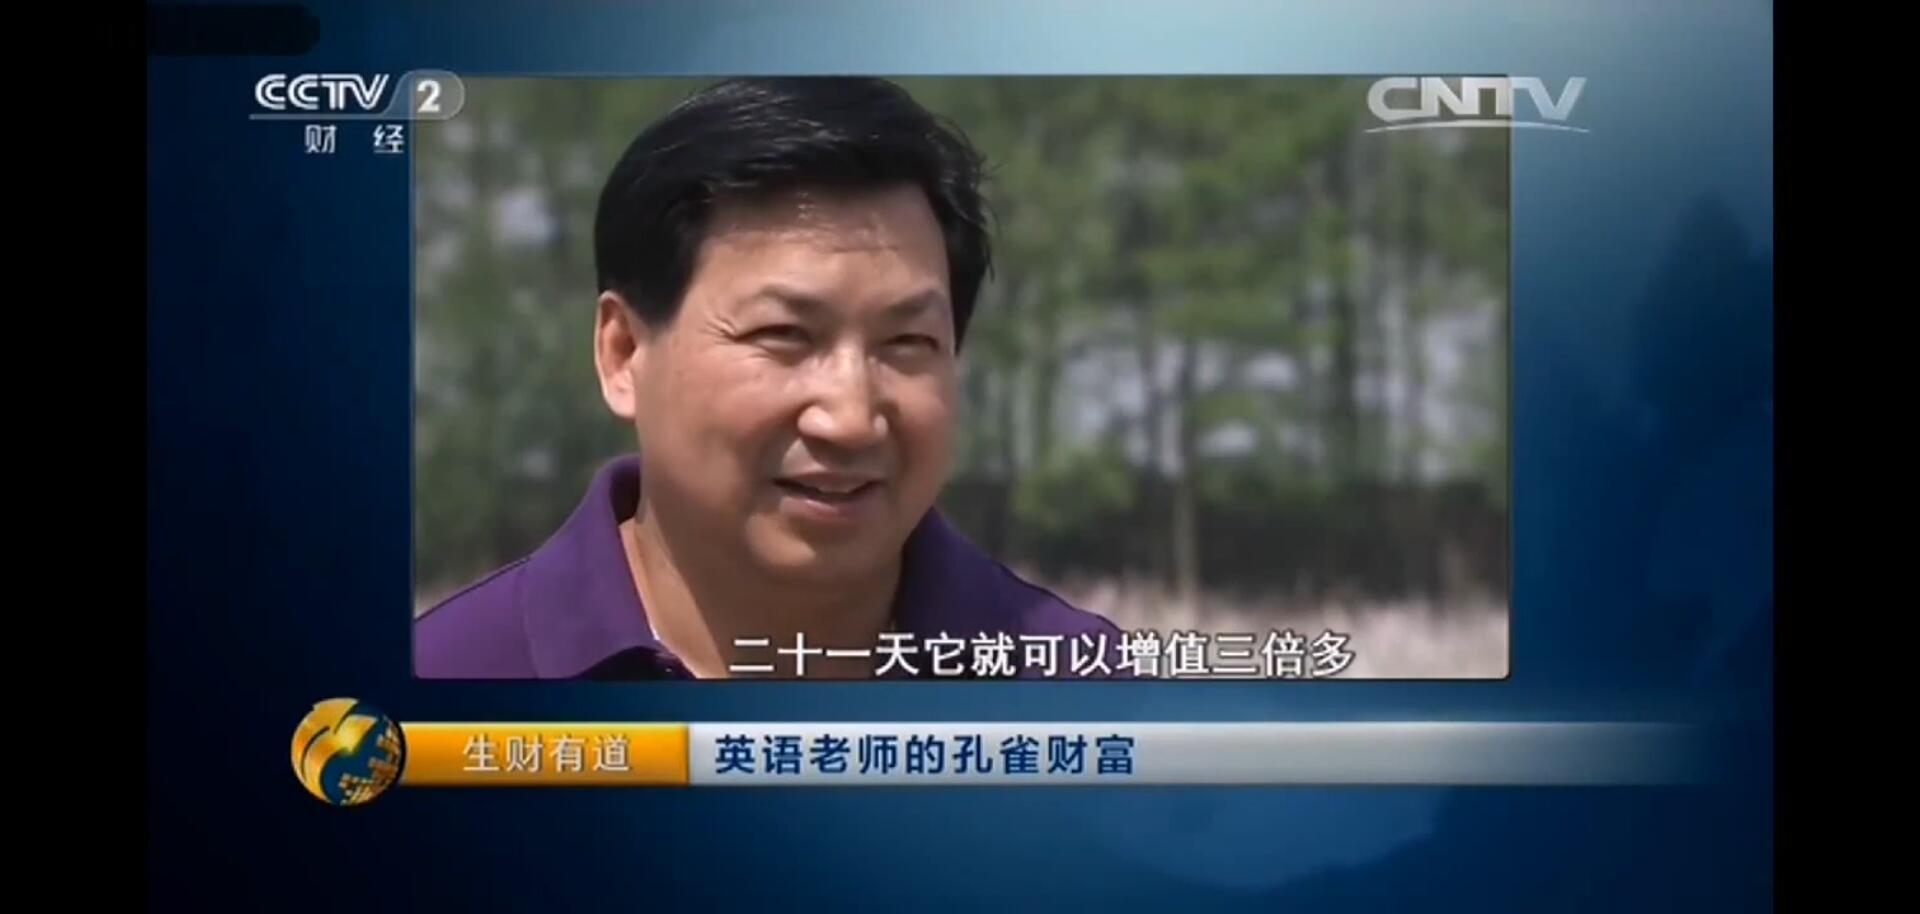 CCTV-2生财有道英语老师的ballbet财富